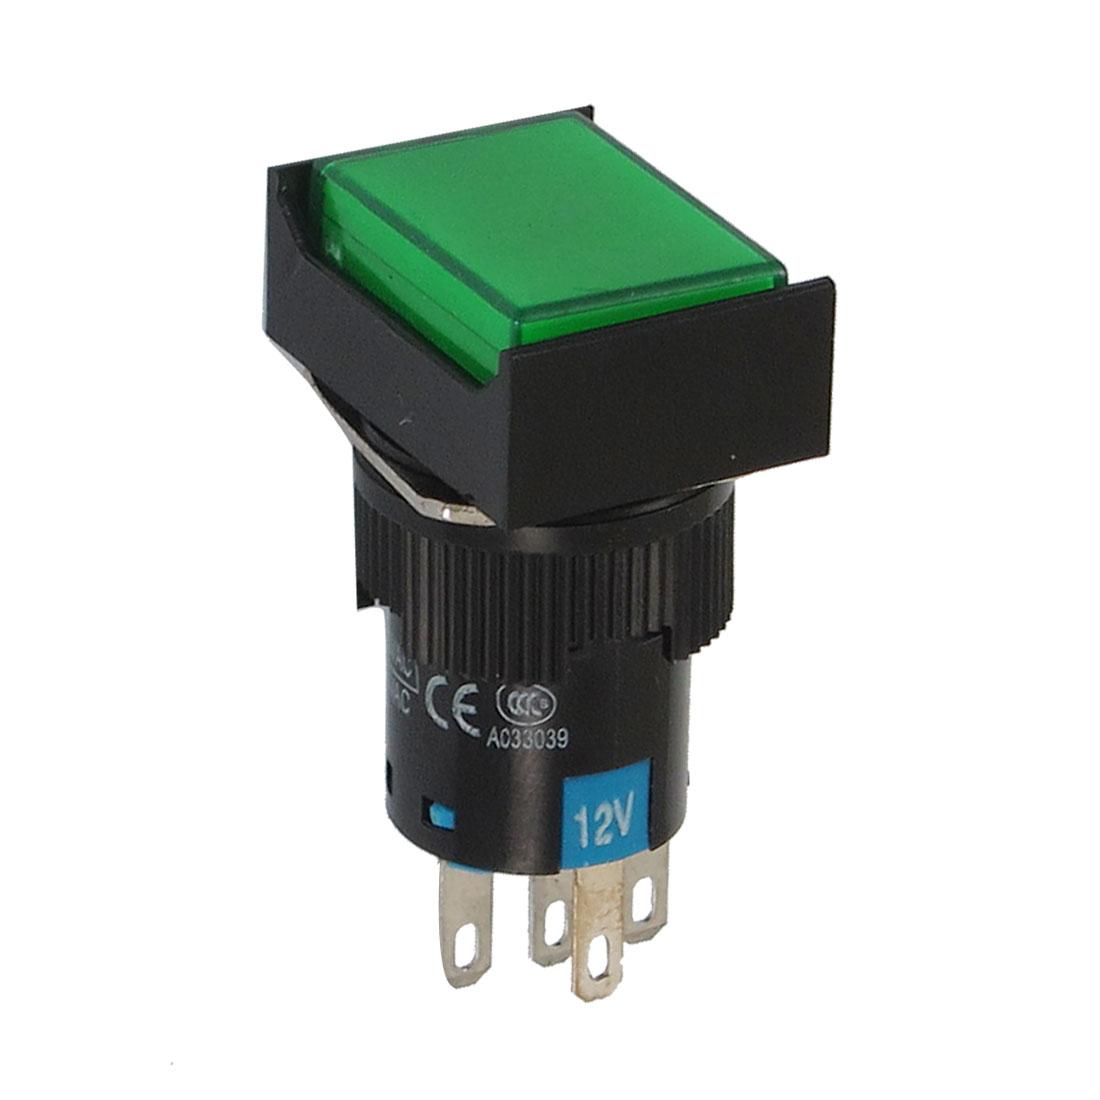 AC 220V/5A AC 250V/5A Green Neon Light Momentary Push Button Switch 12V